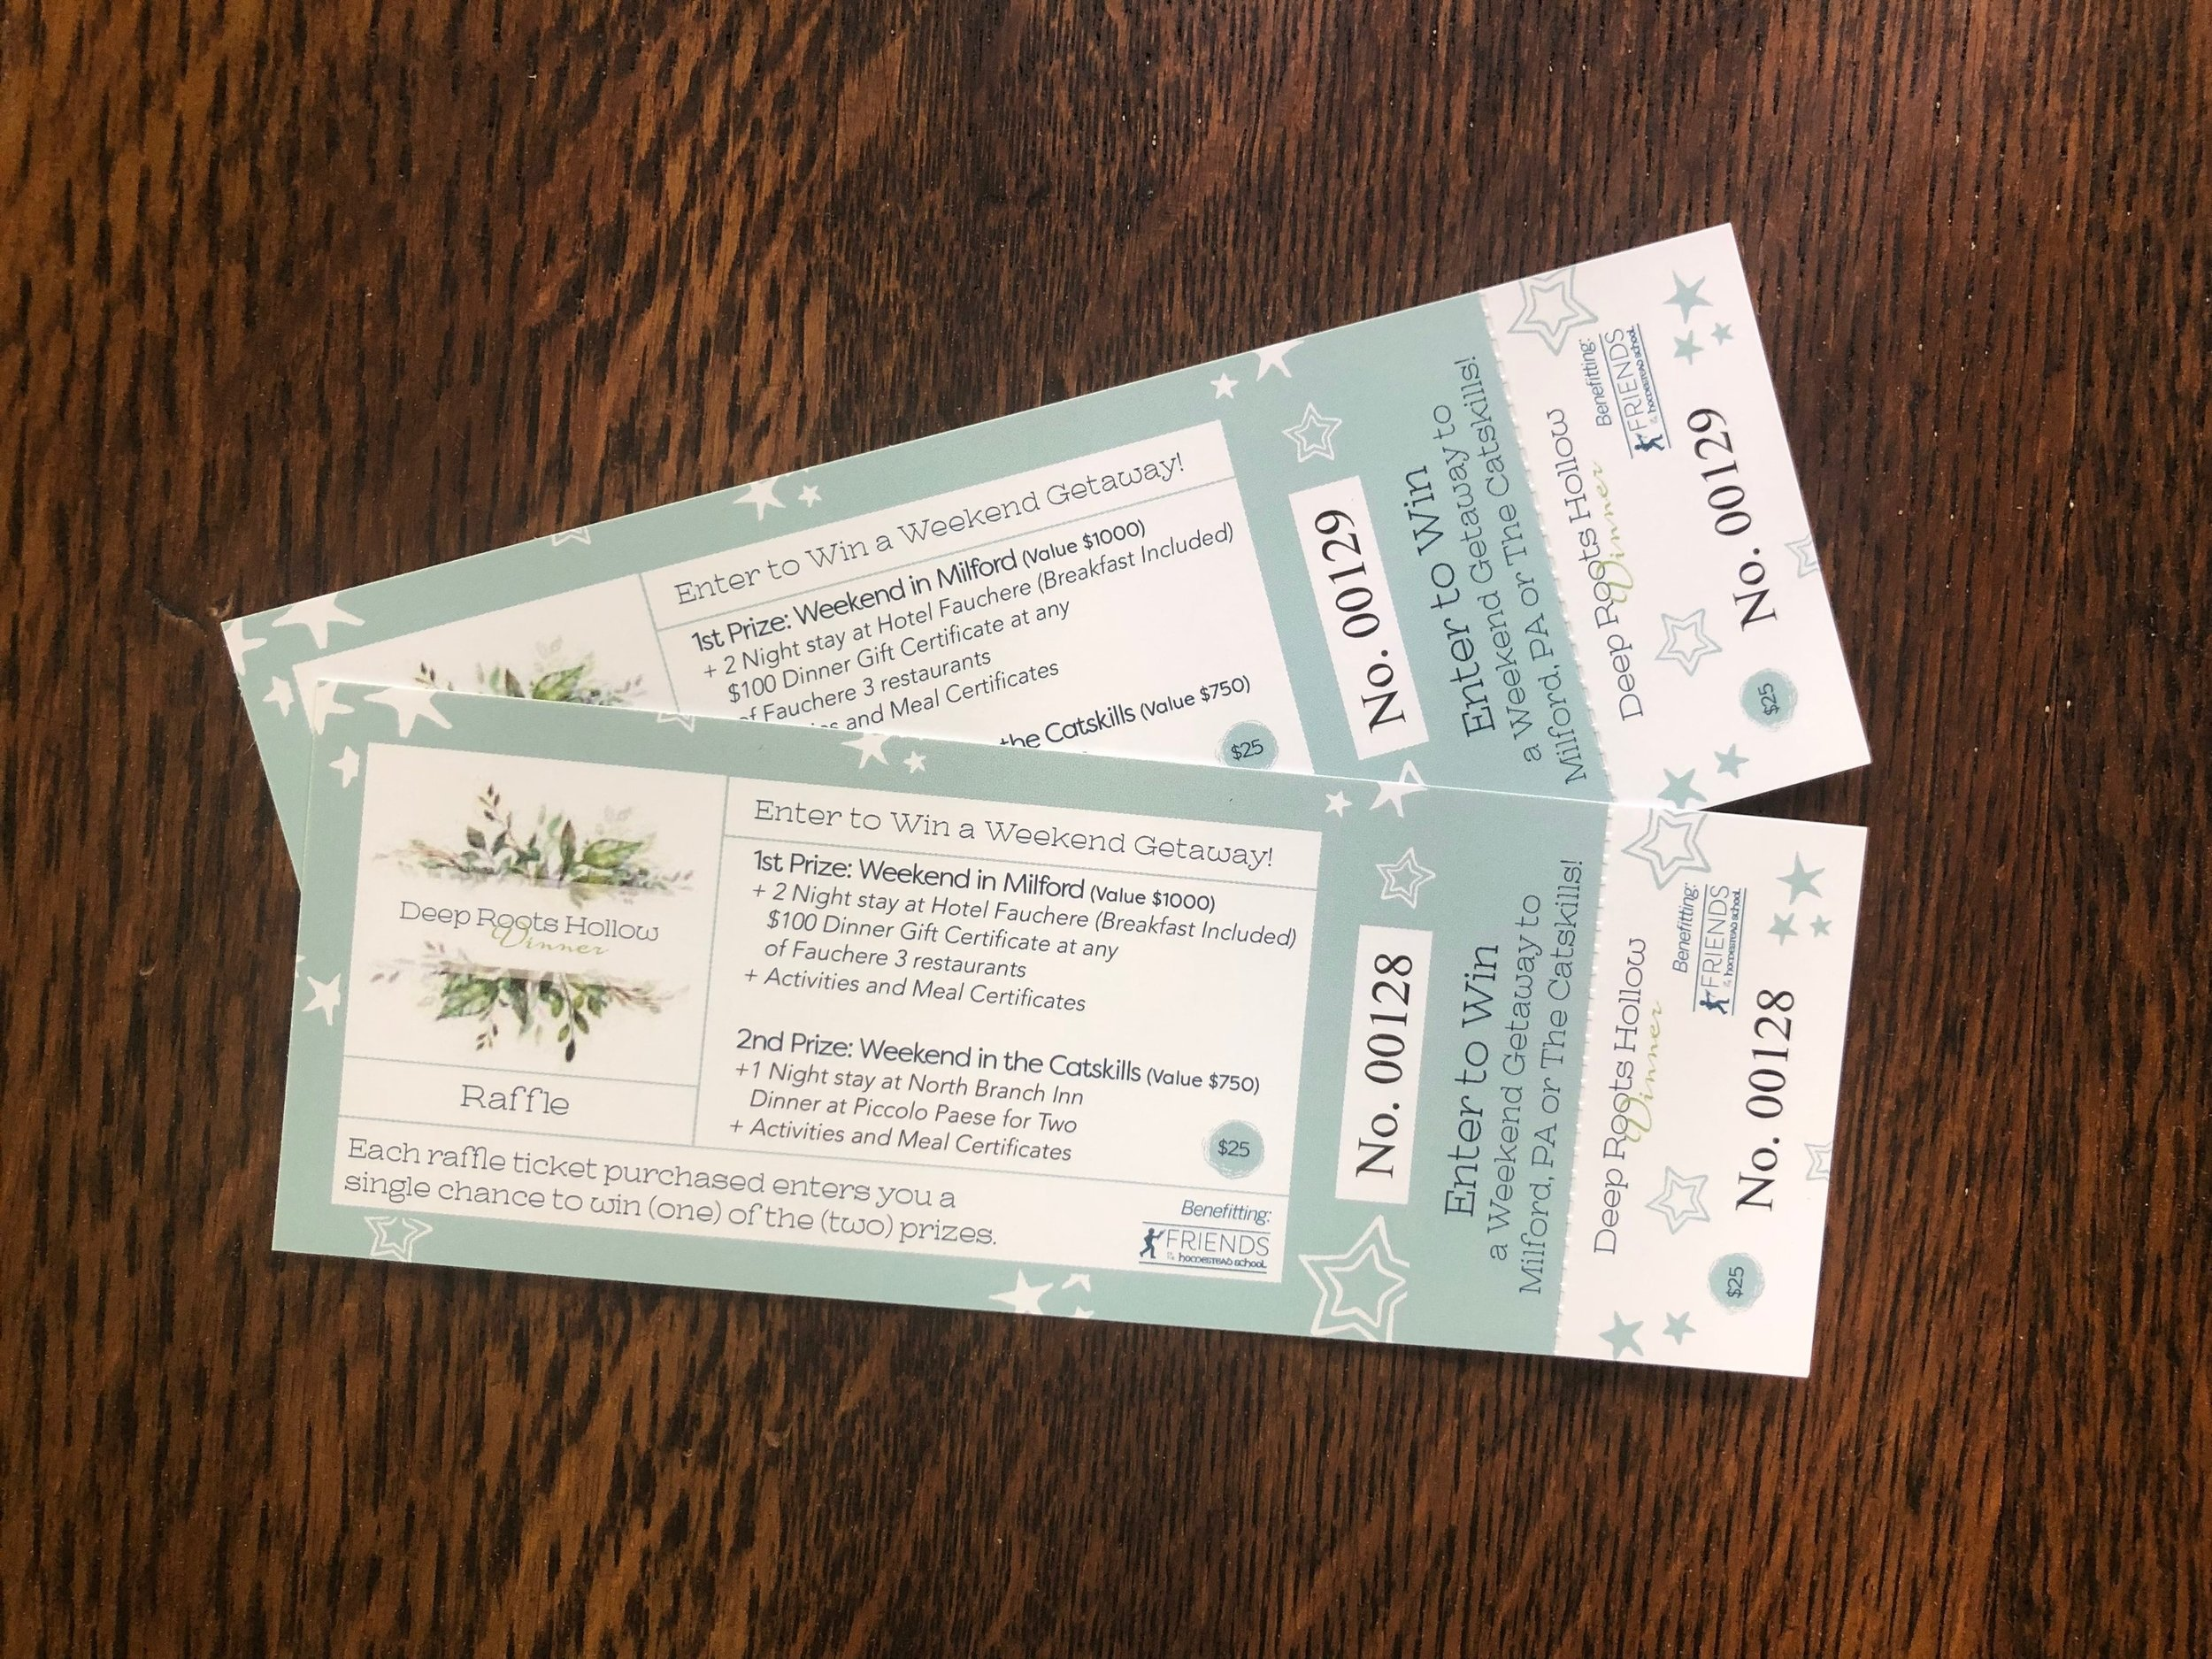 Friends of Homestead School   Glen Spey, NY   Raffle Ticket design for an anniversary dinner event honoring Homestead School.